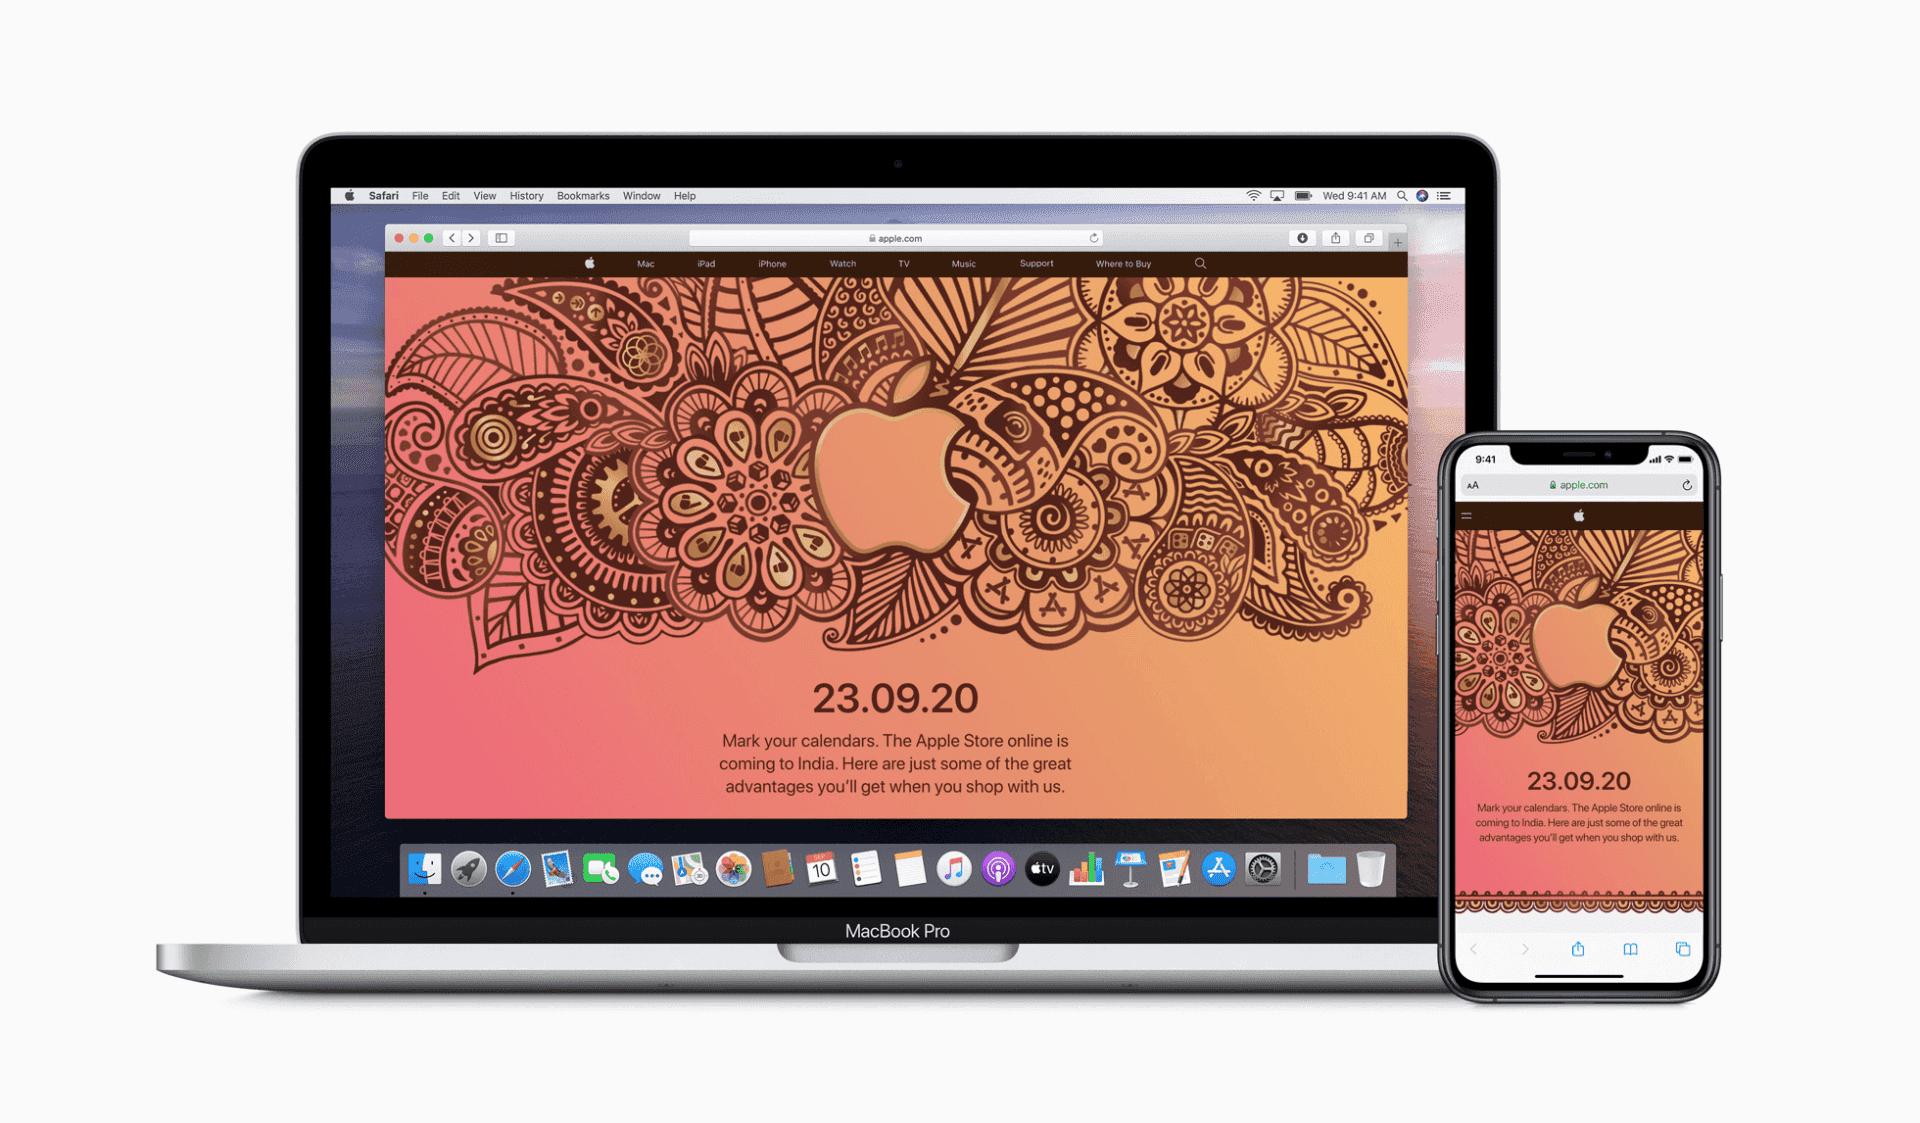 Apple Online Store kommer till Indien den 23 september